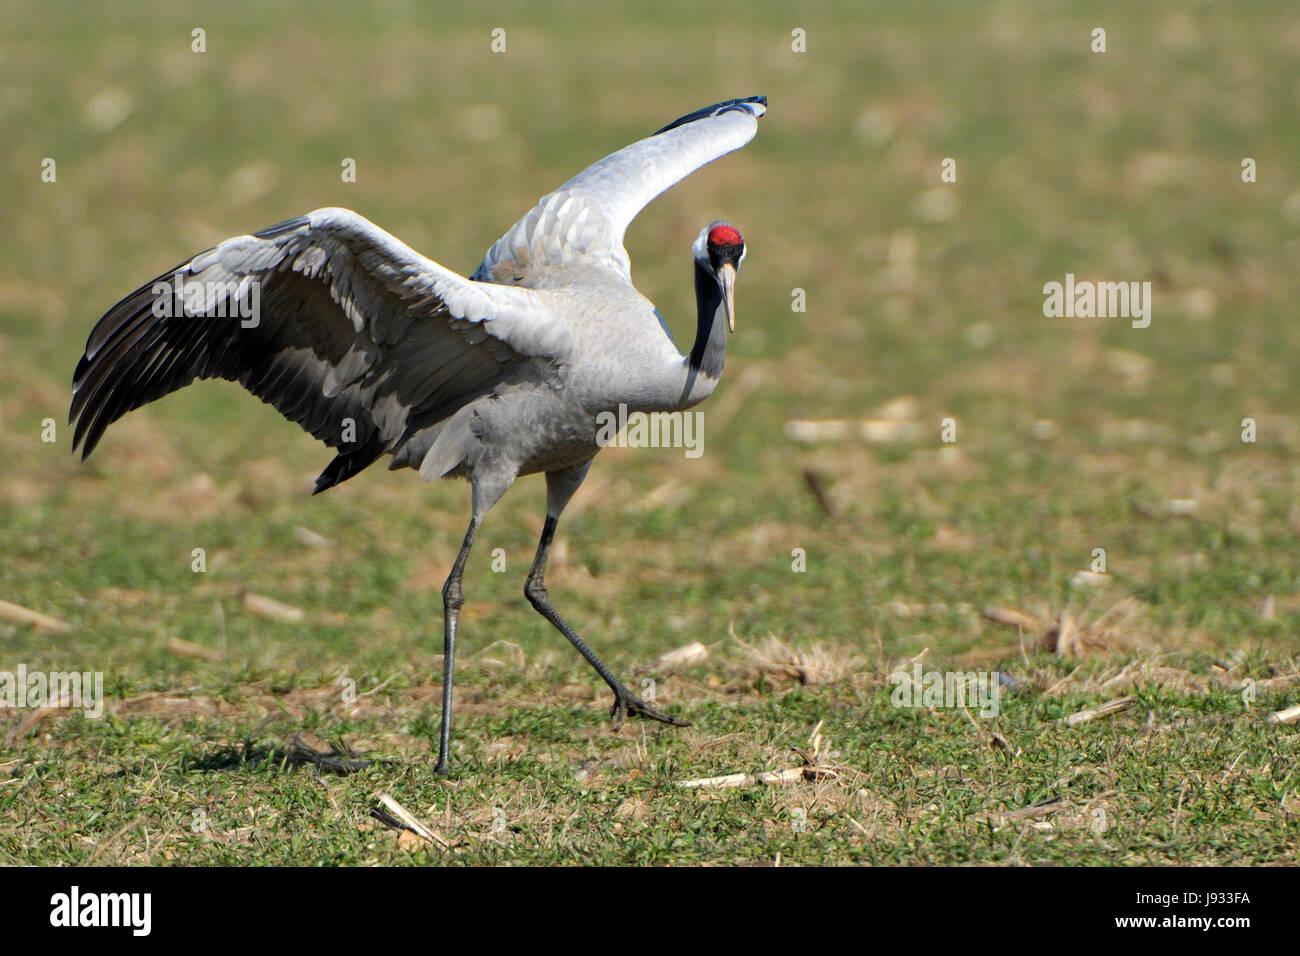 bird, birds, crane, grayer, gravel, salute, greeting, animal, bird, asia, Stock Photo